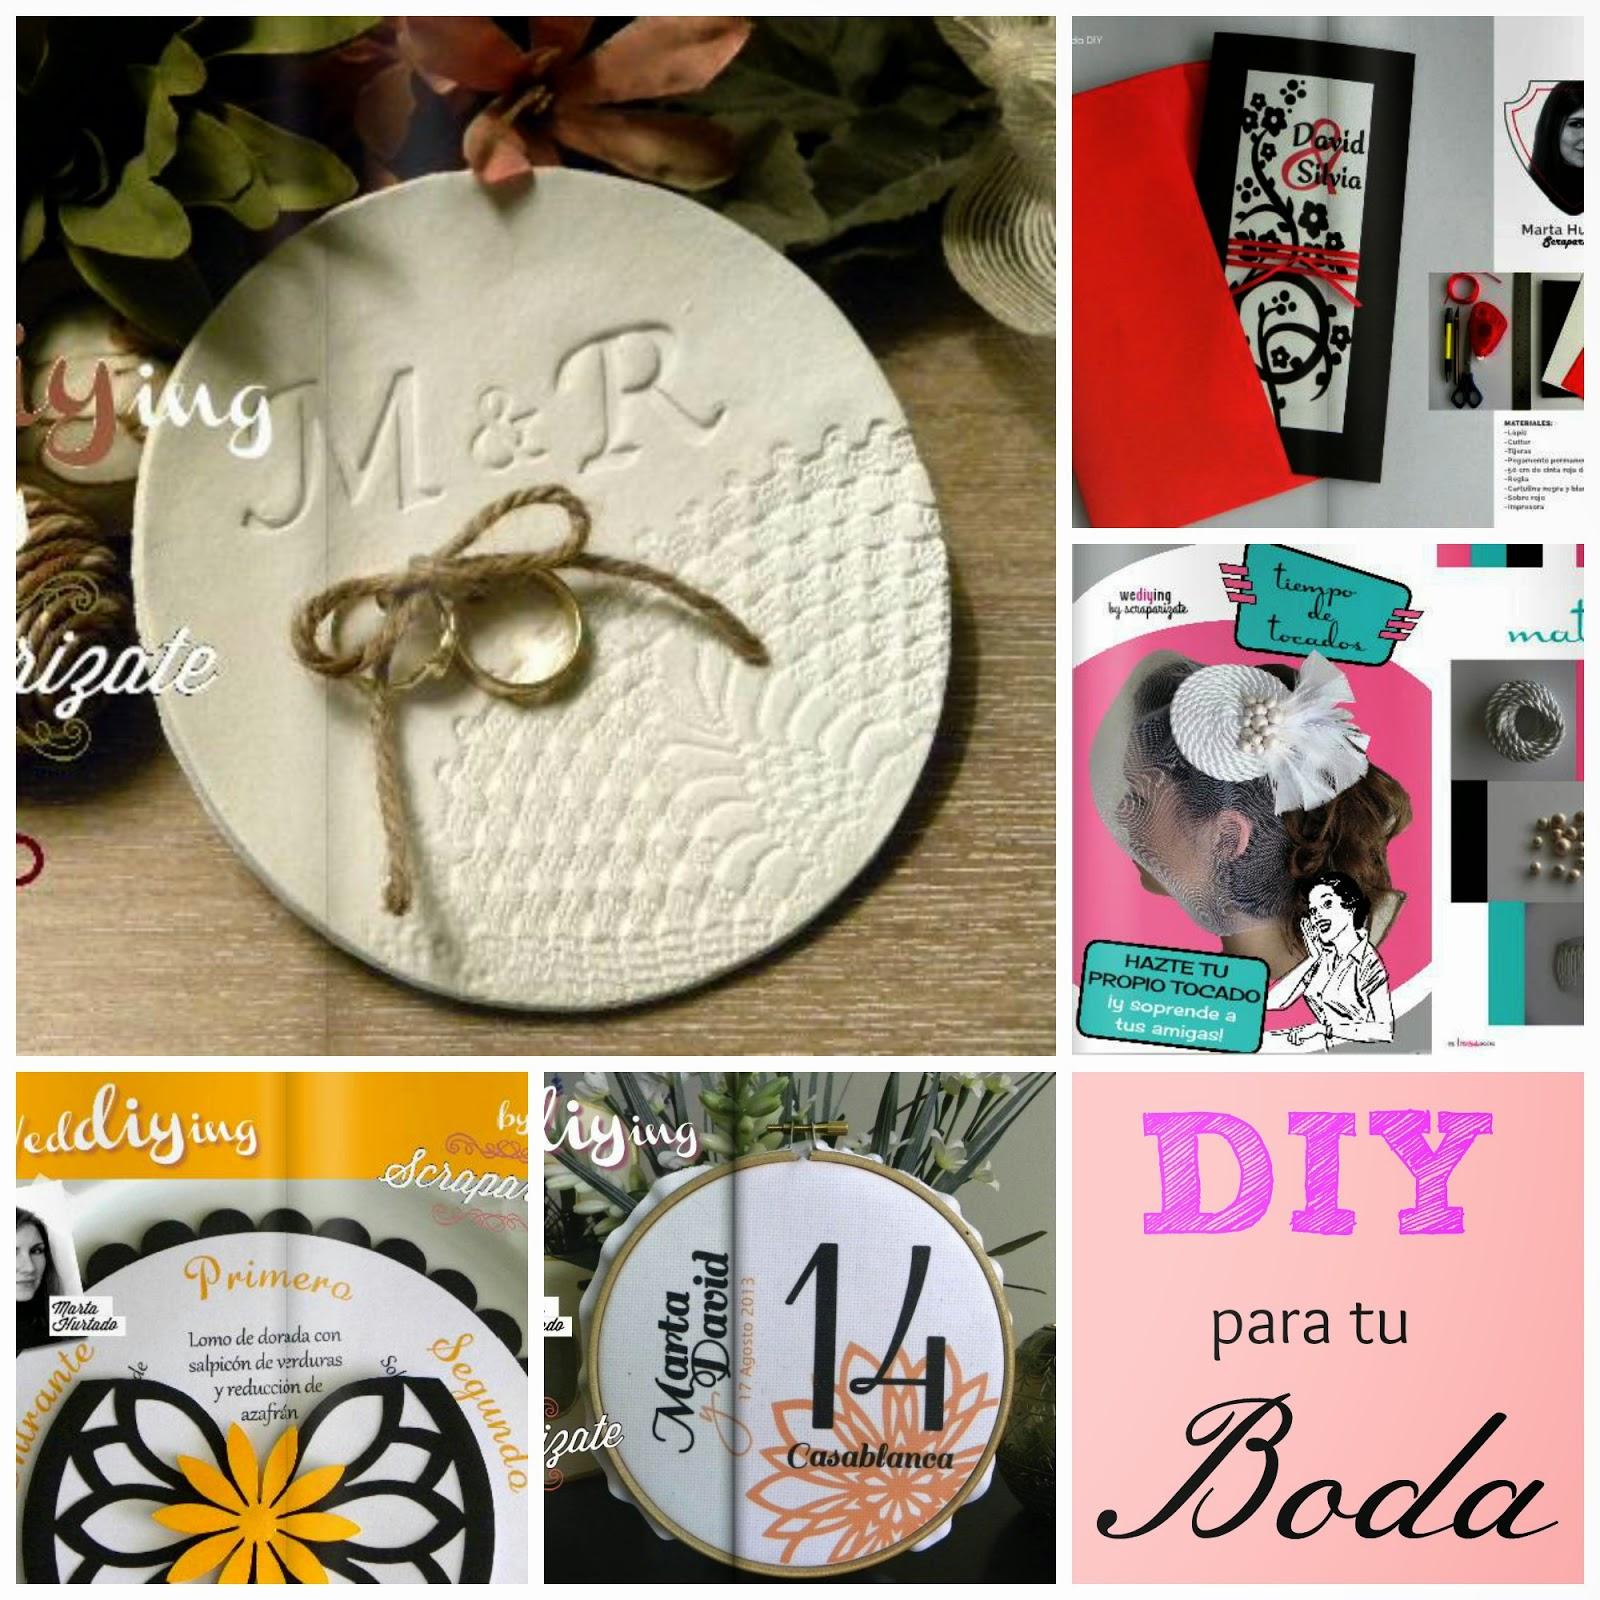 5 DIY originales para tu Boda blog de bodas